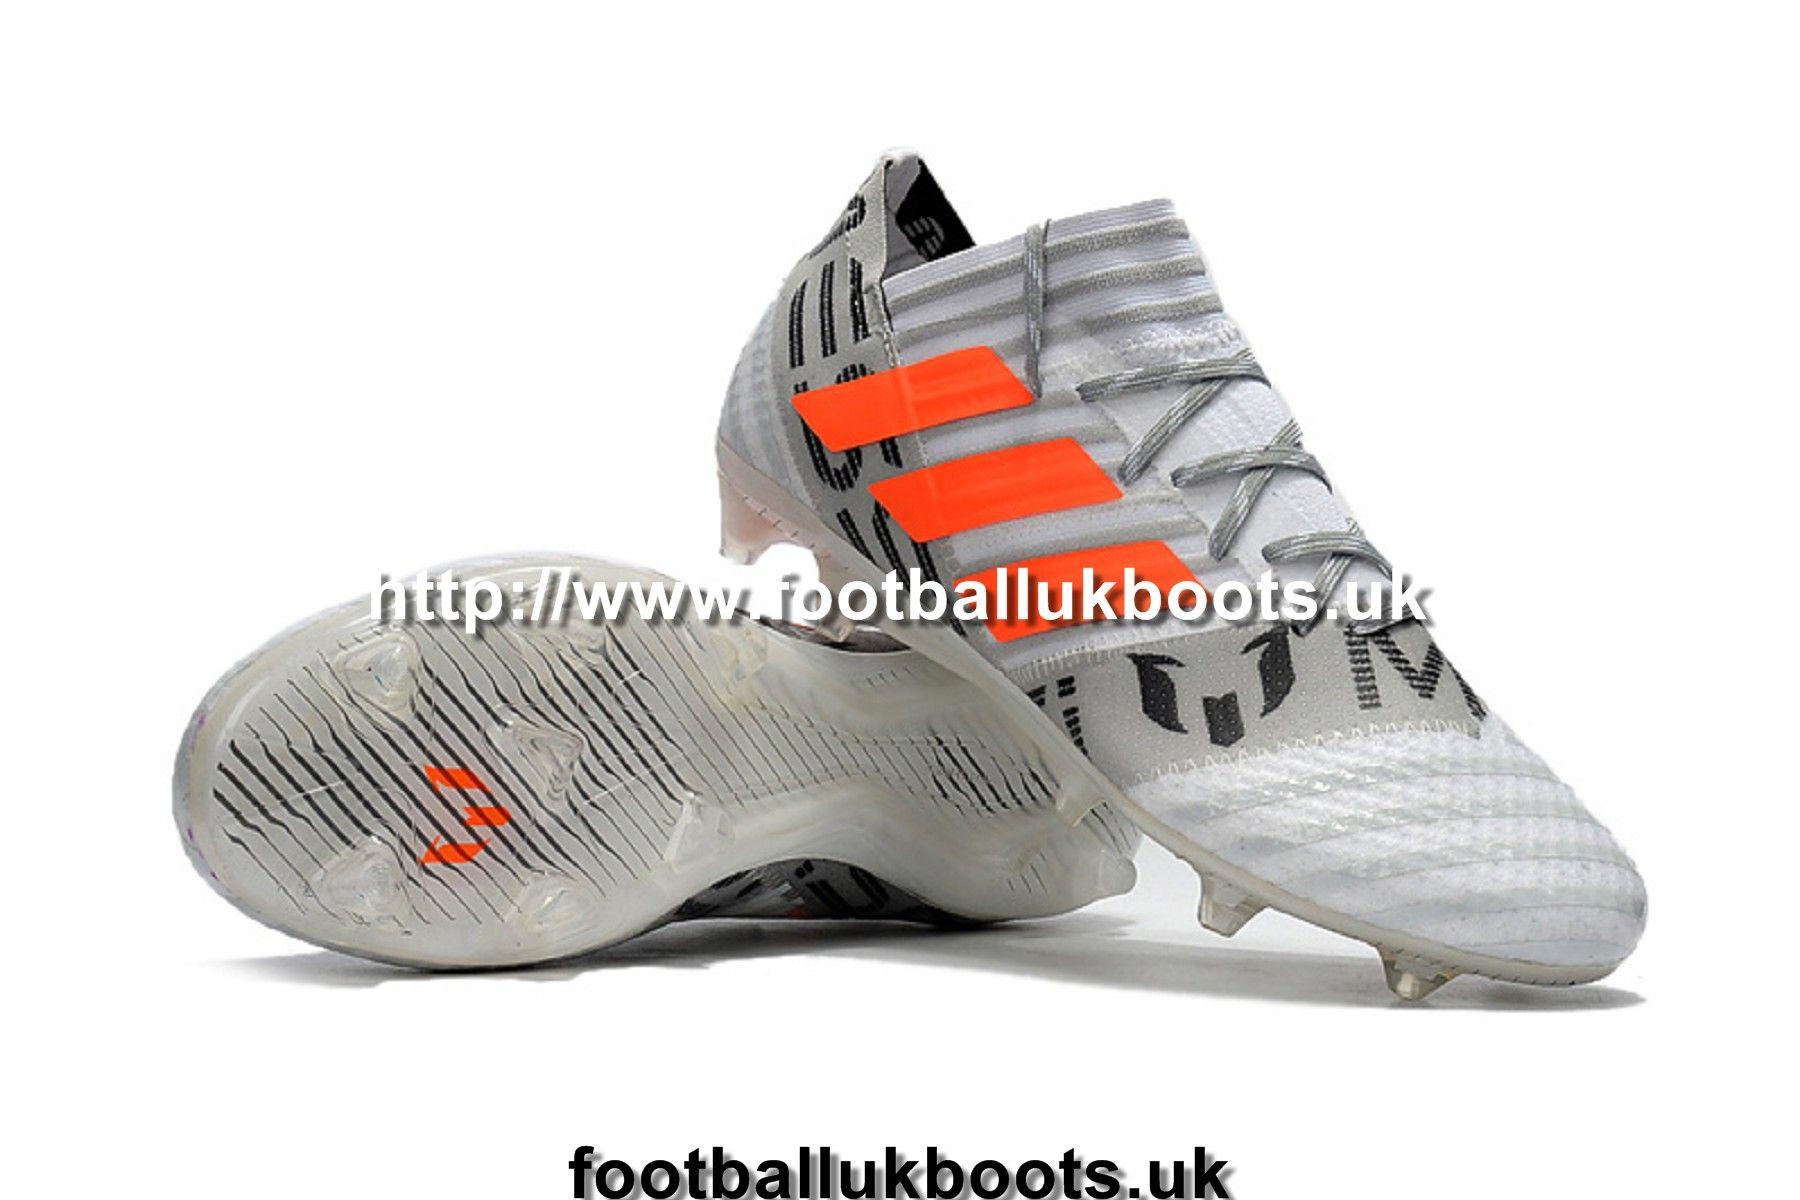 online store f5fee 55347 Adidas Nemeziz 17.1 FG Football boots - White Grey Orange Web